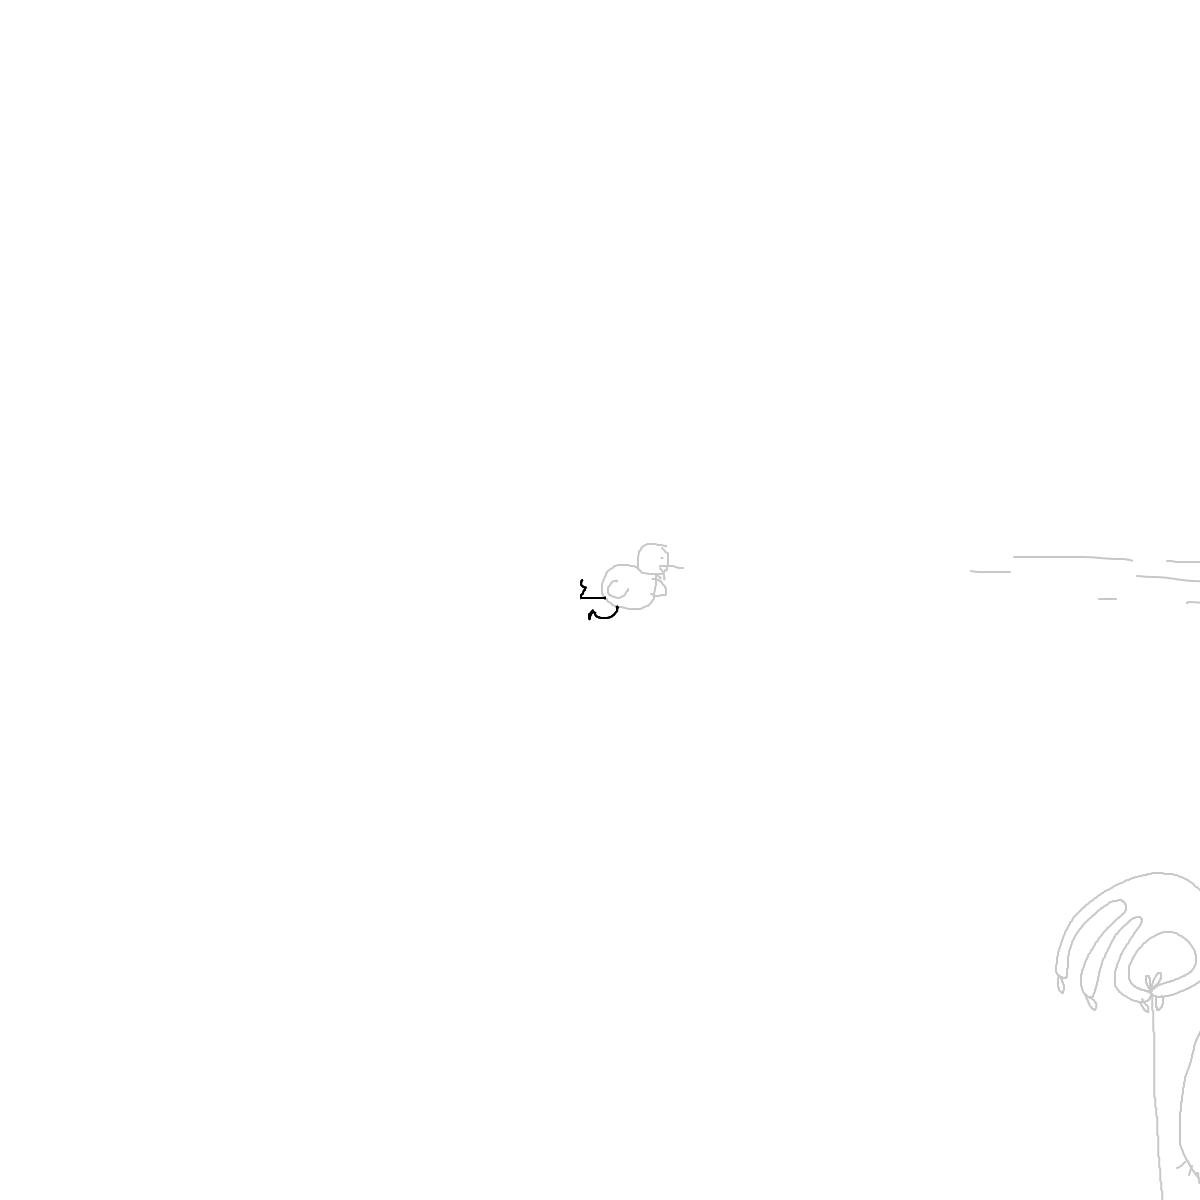 BAAAM drawing#24129 lat:78.4207534790039000lng: -4.4877629280090330